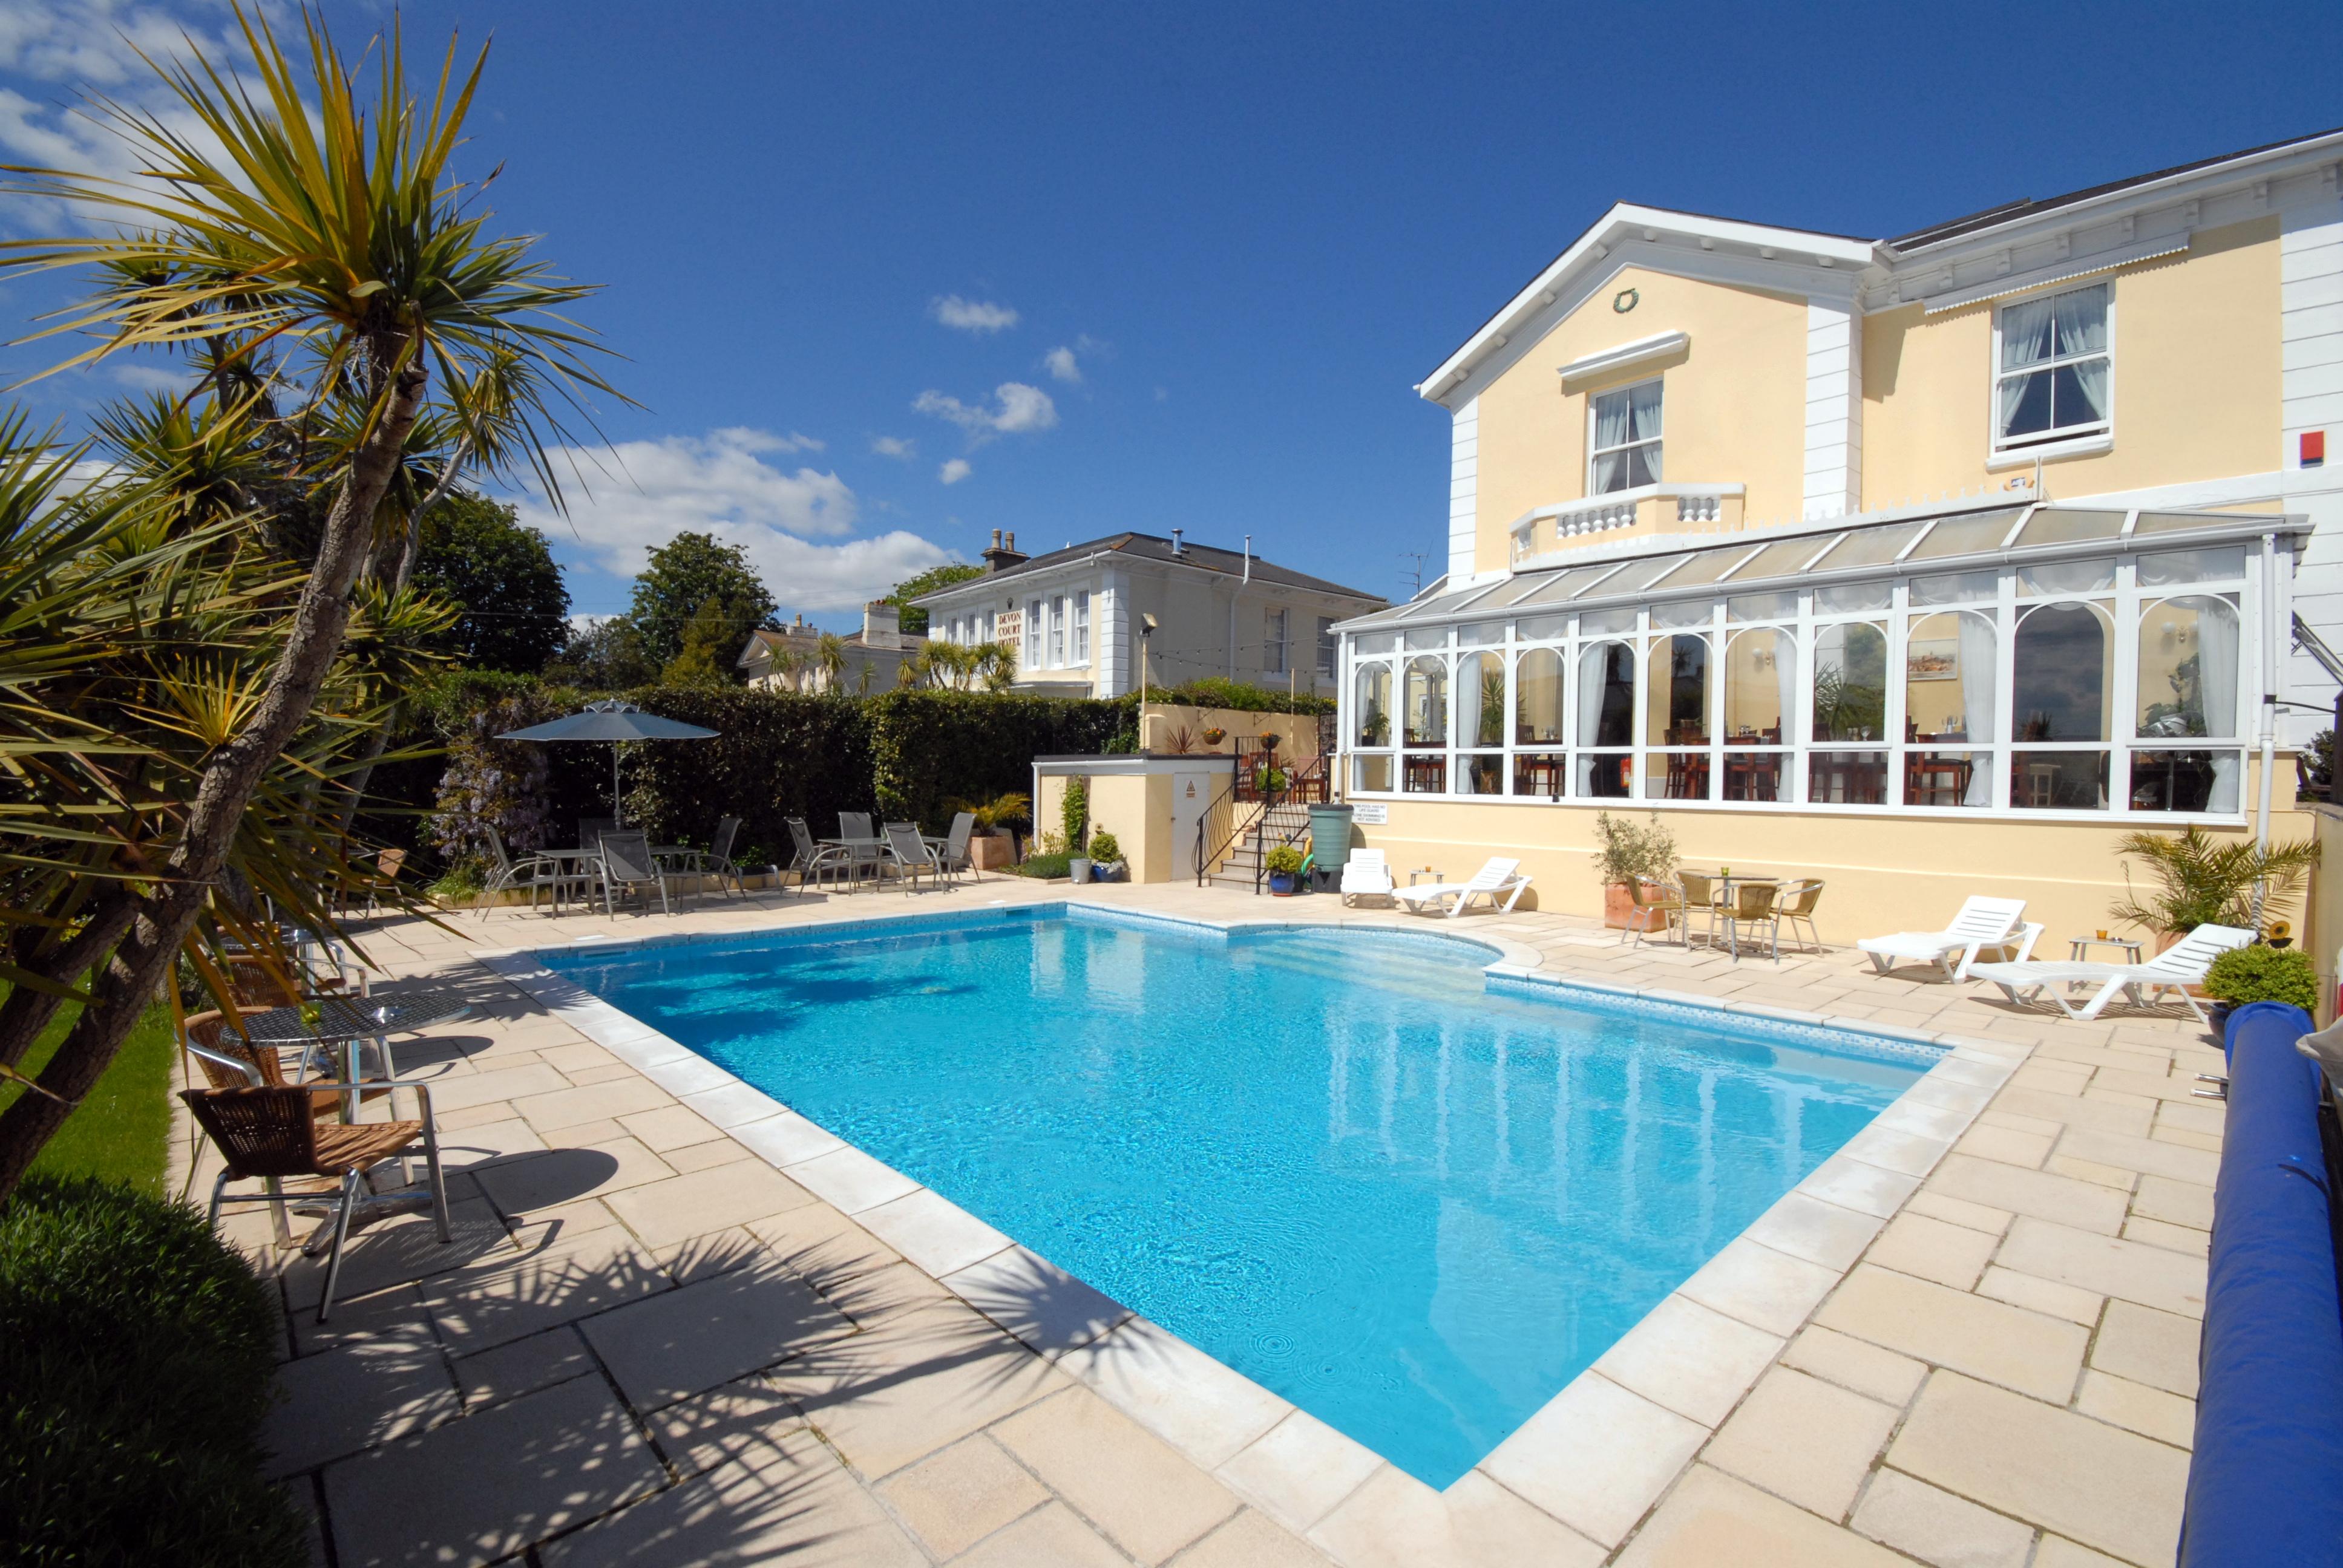 Riviera Lodge Hotel Torquay